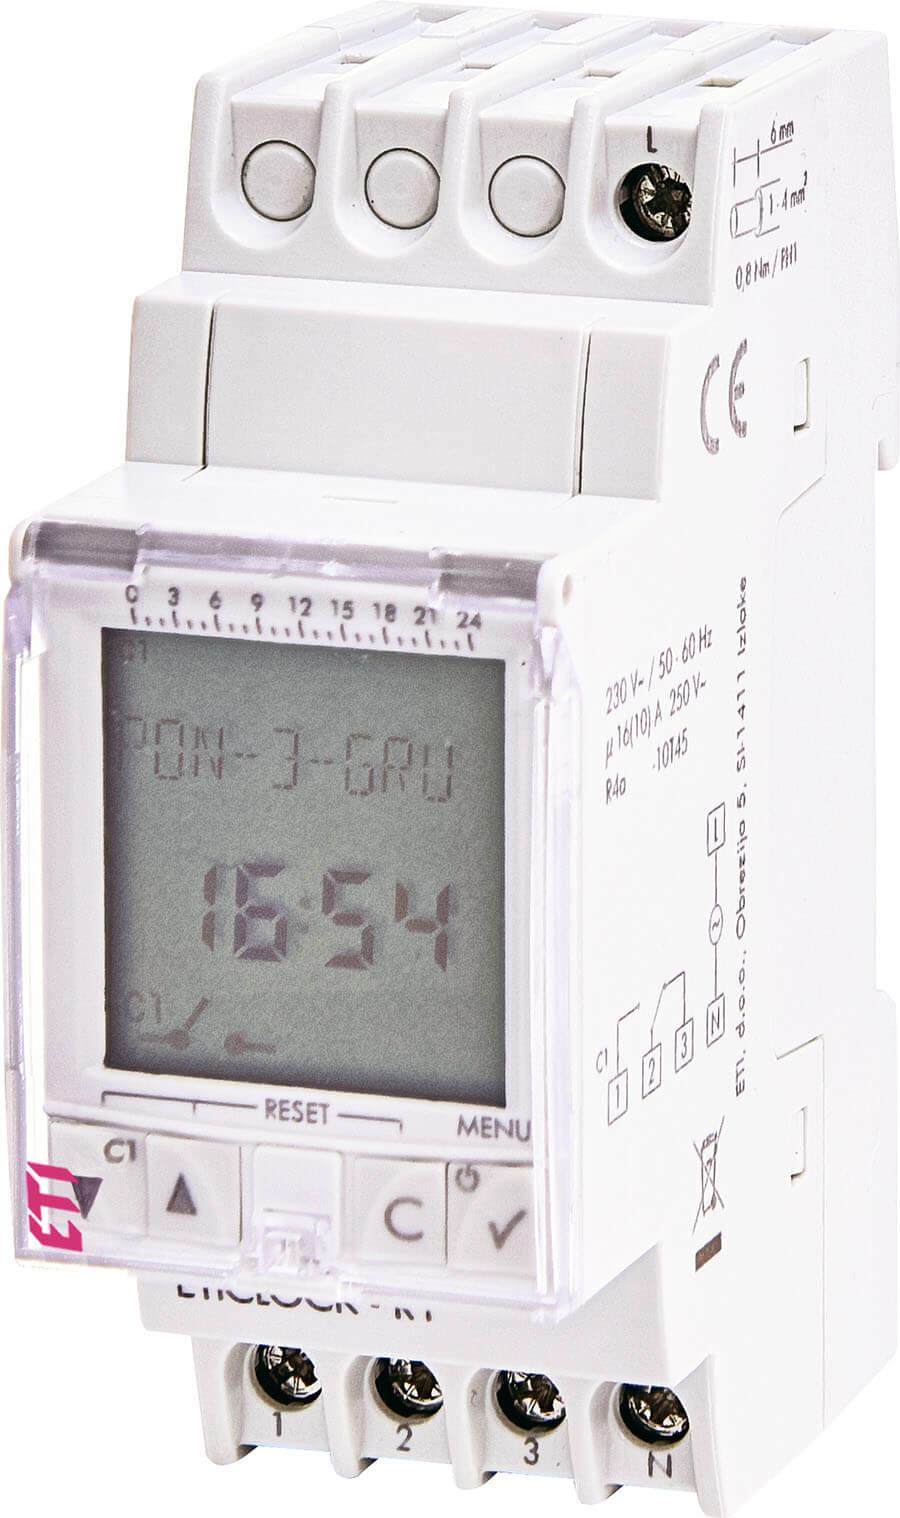 Цифровой таймер ETI 002472053 Eticlock-R1 230V